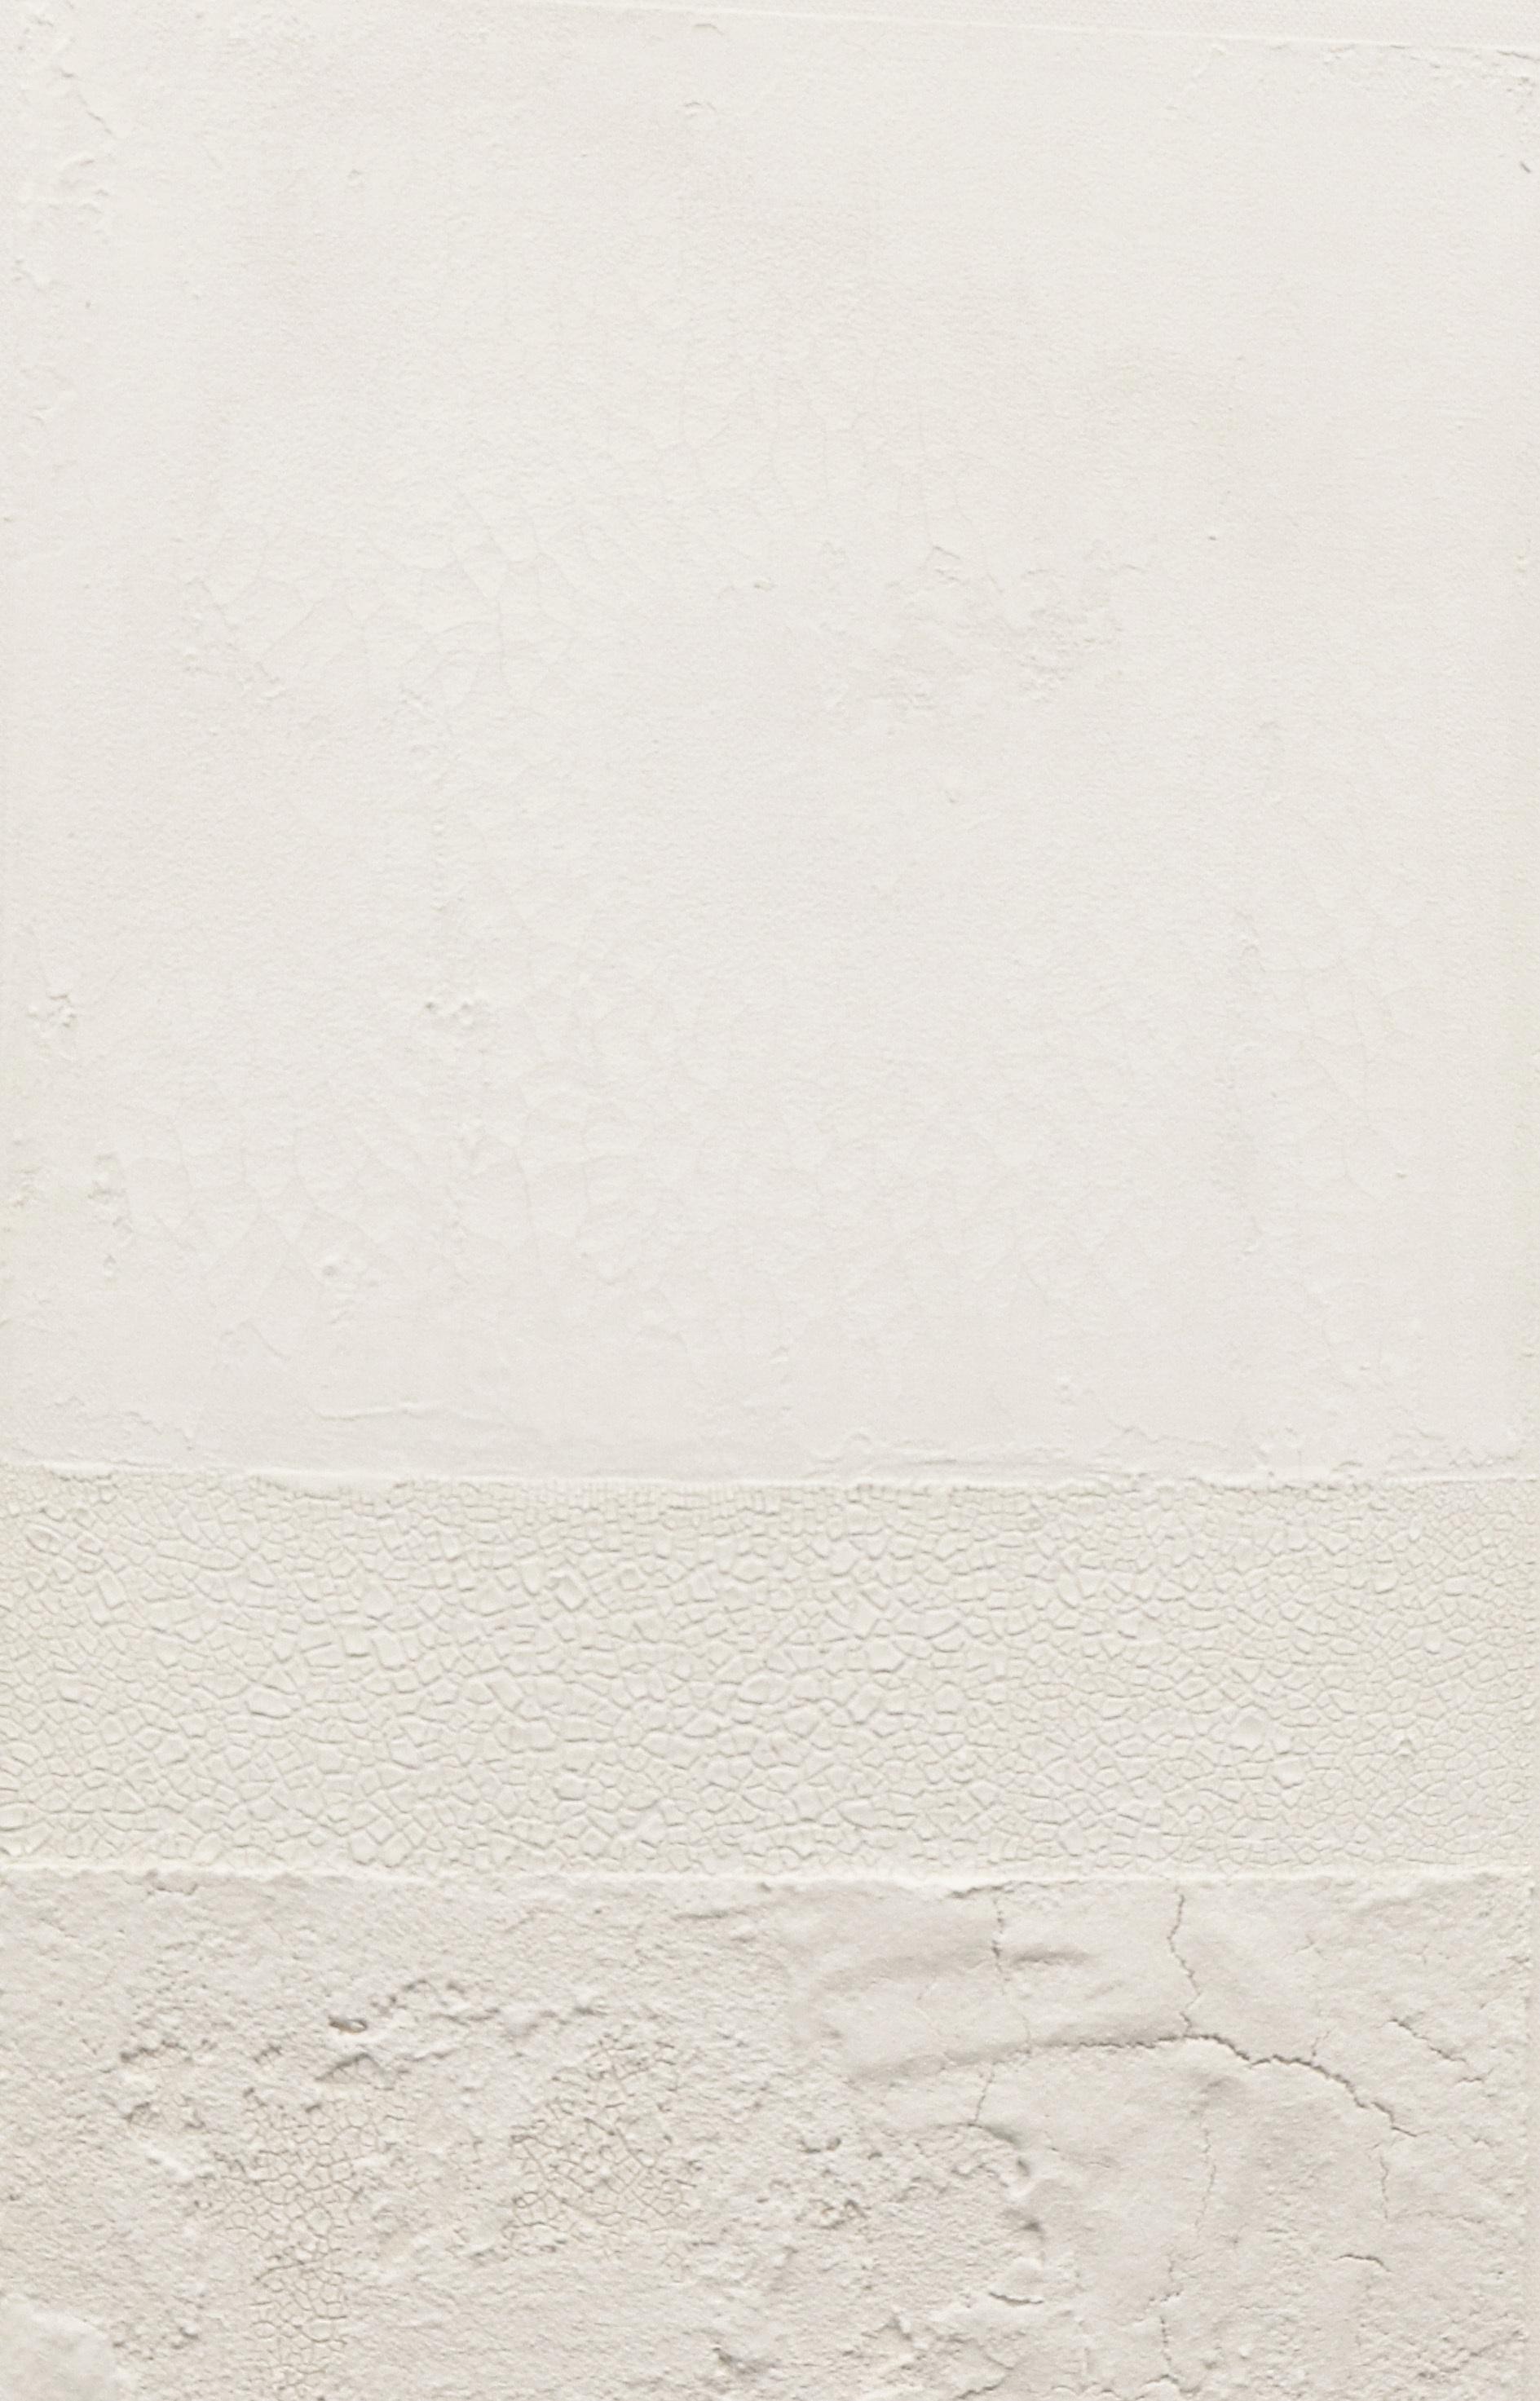 Fundamentality of White (Close up shot)